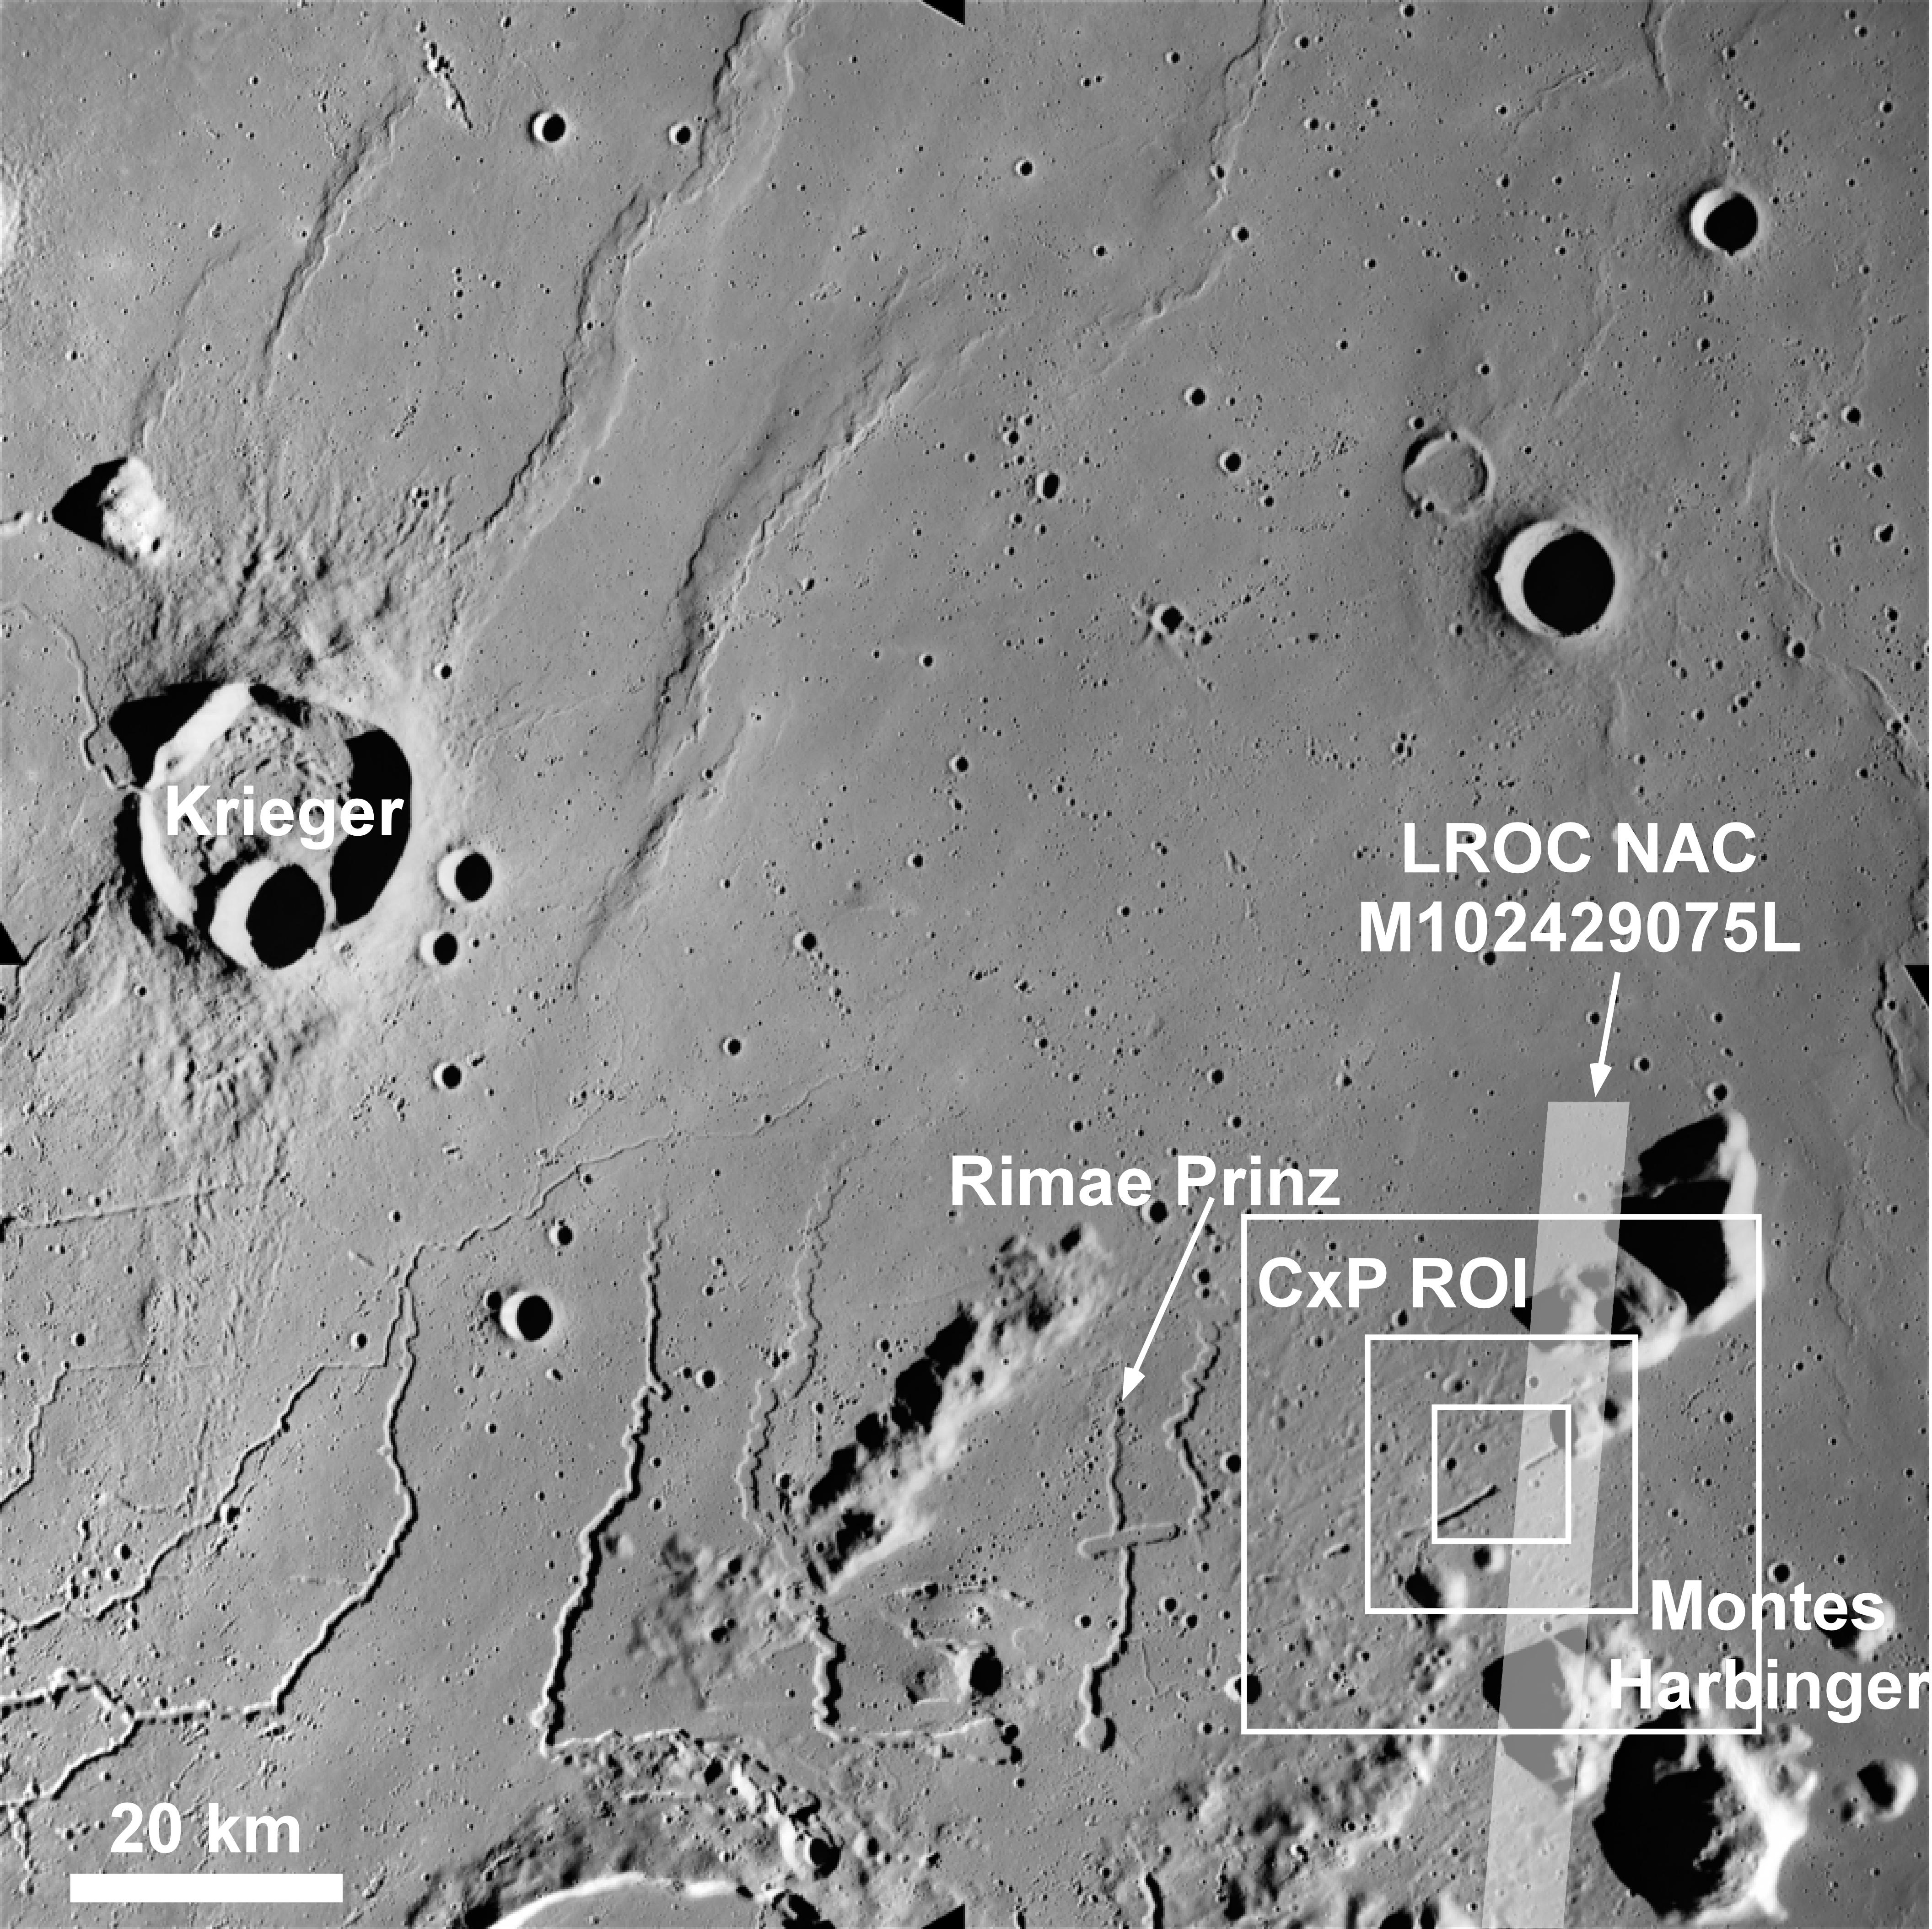 apollo tracks on moon - photo #10